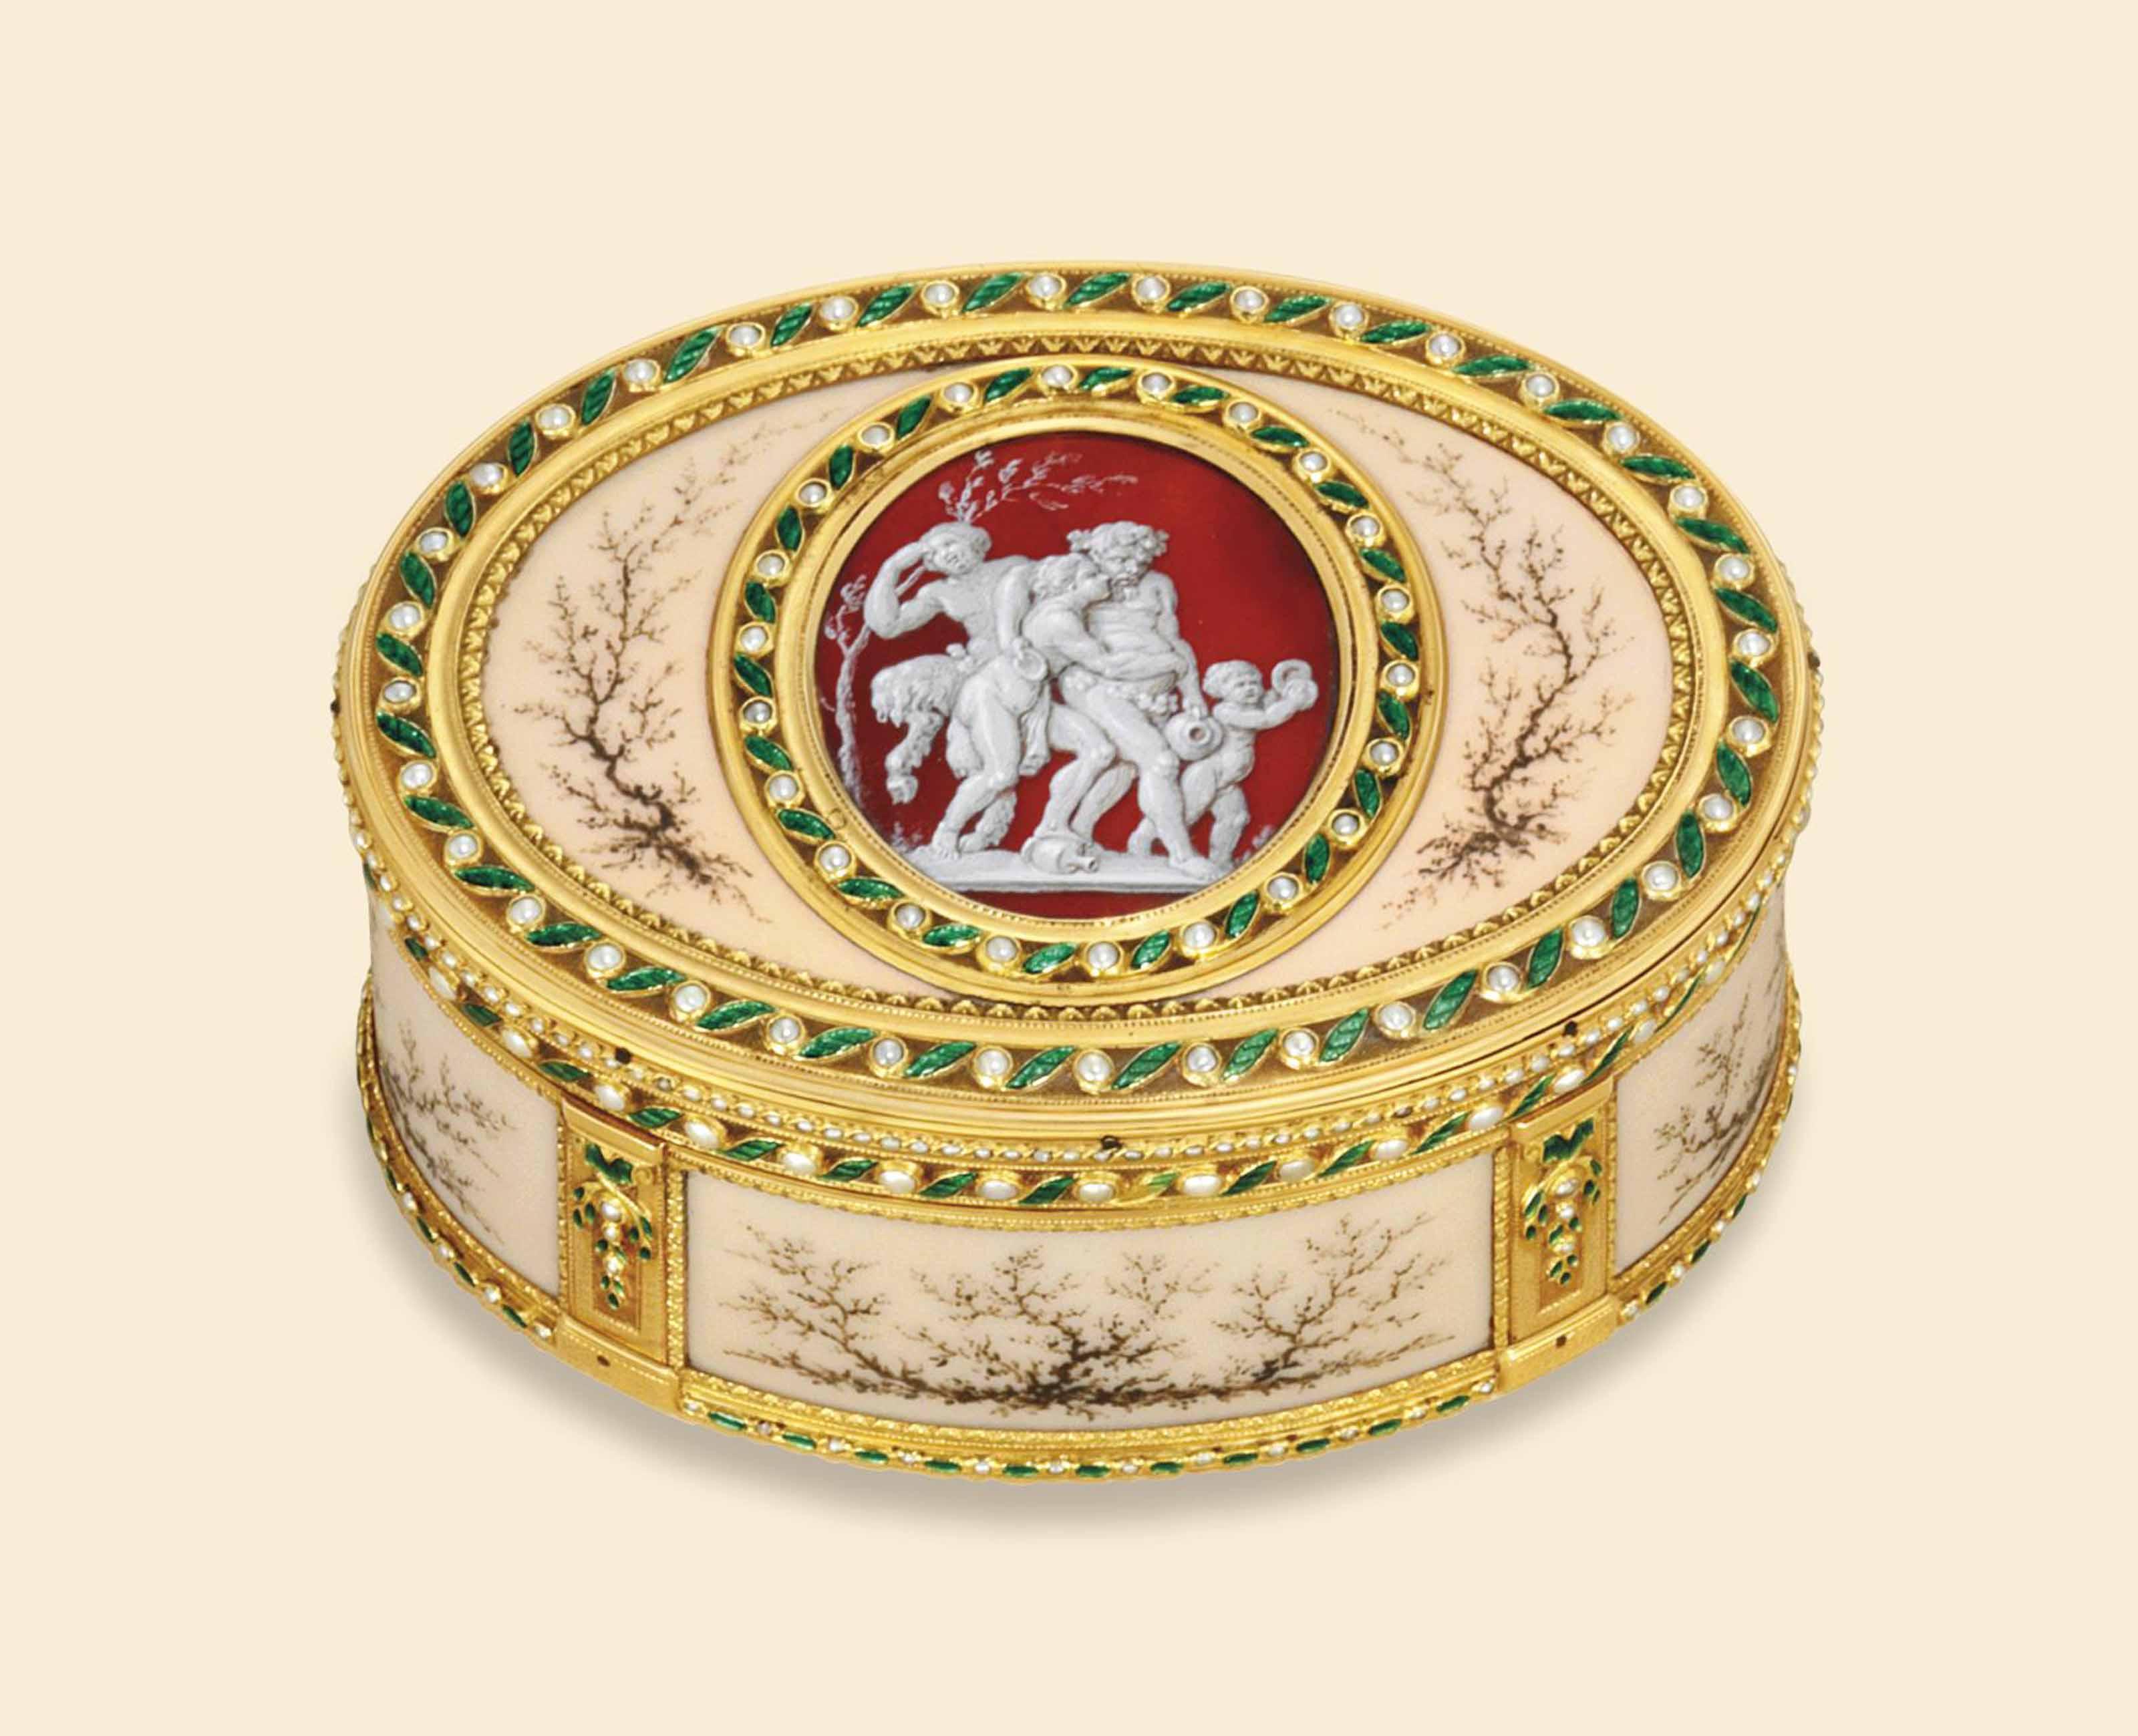 A LOUIS XVI JEWELLED ENAMELLED GOLD SNUFF-BOX